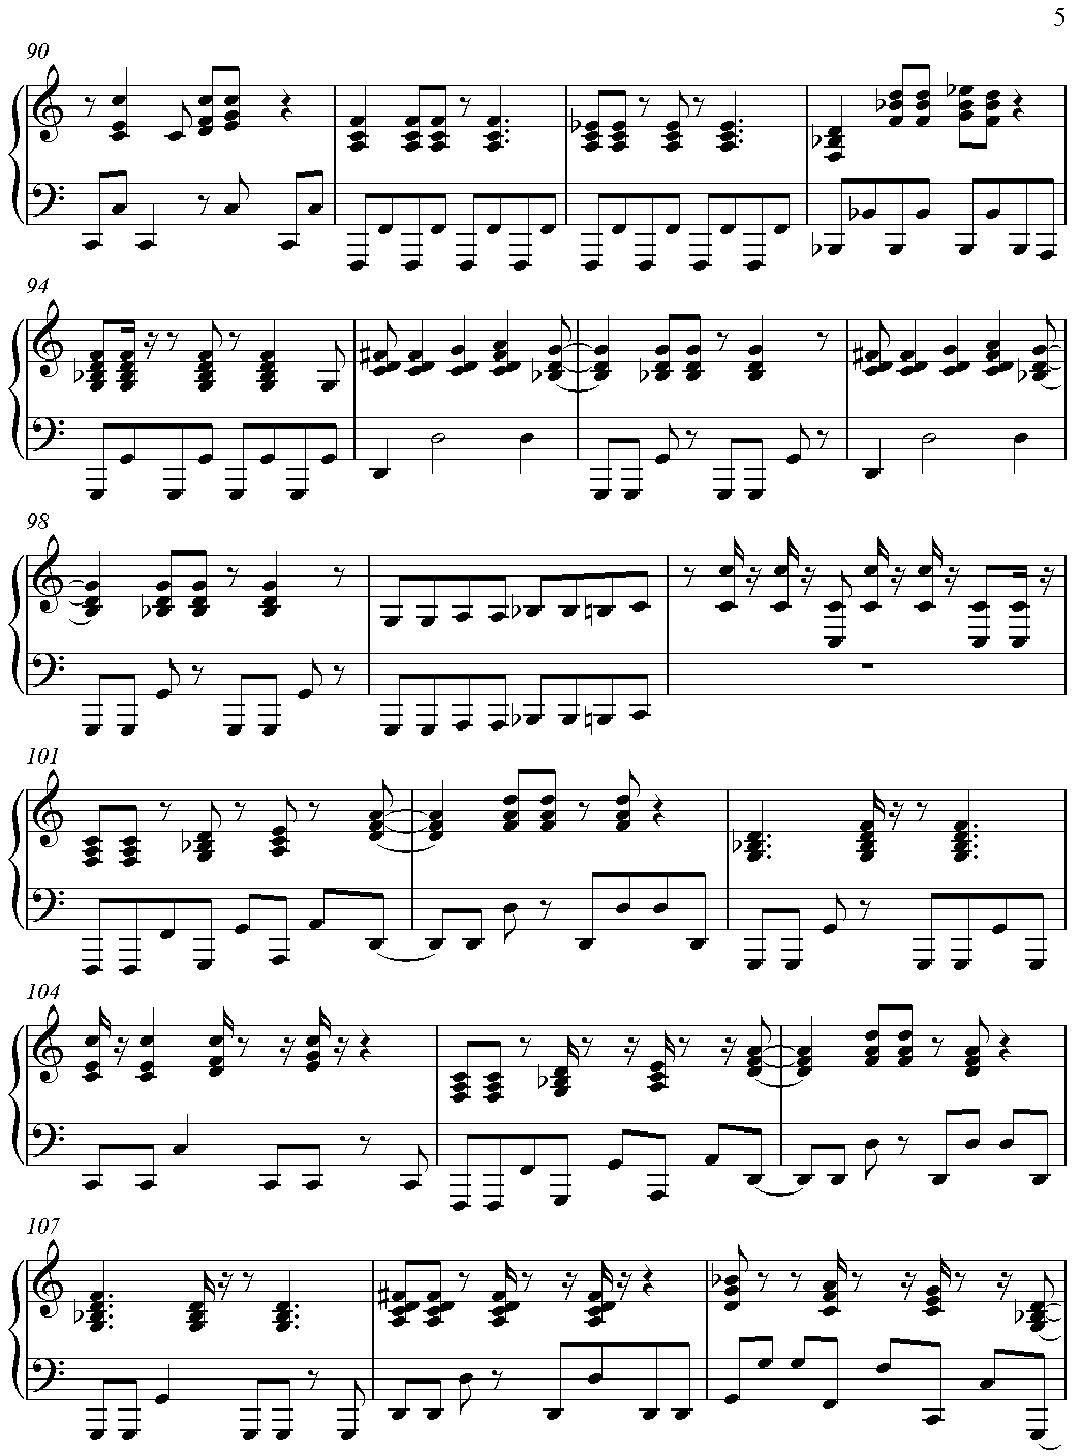 "Partitura para Piano ""Don't Stop Me Now"" | Partituras ..."